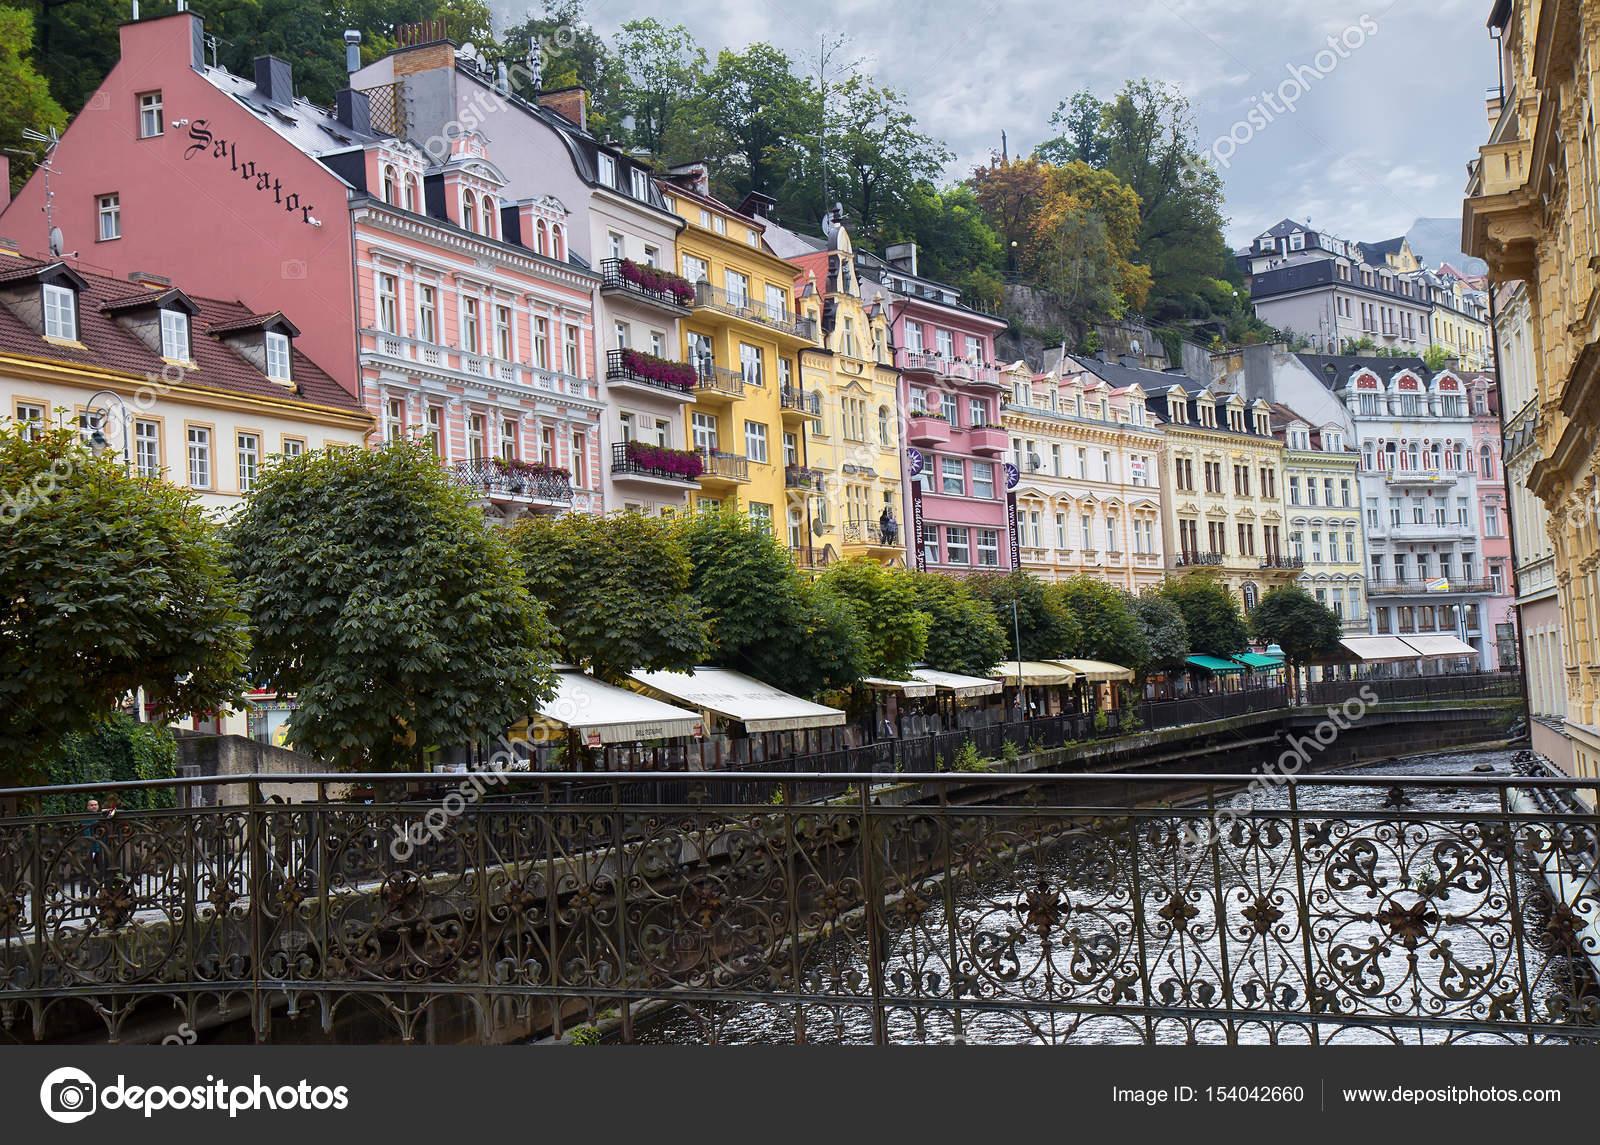 Calle en Karlovy Vary (Karlsbad), República Checa — Fotos